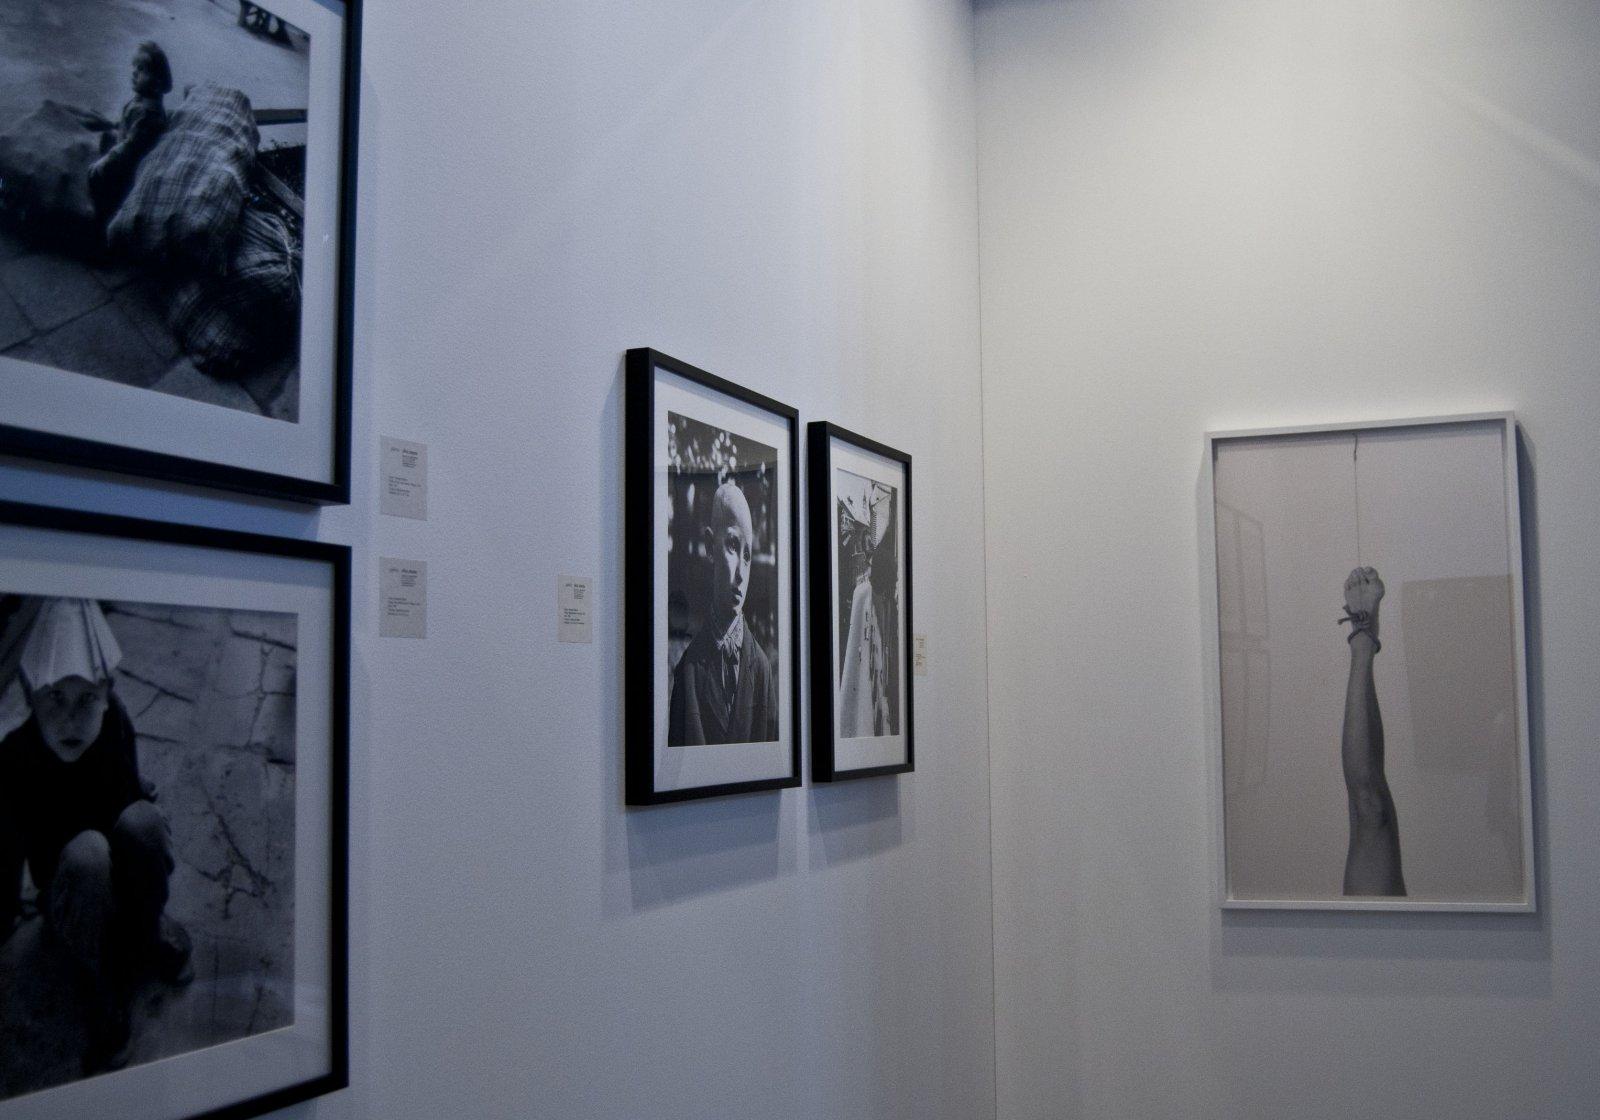 Galería Oliva Arauna. SUMMA Fair 2014